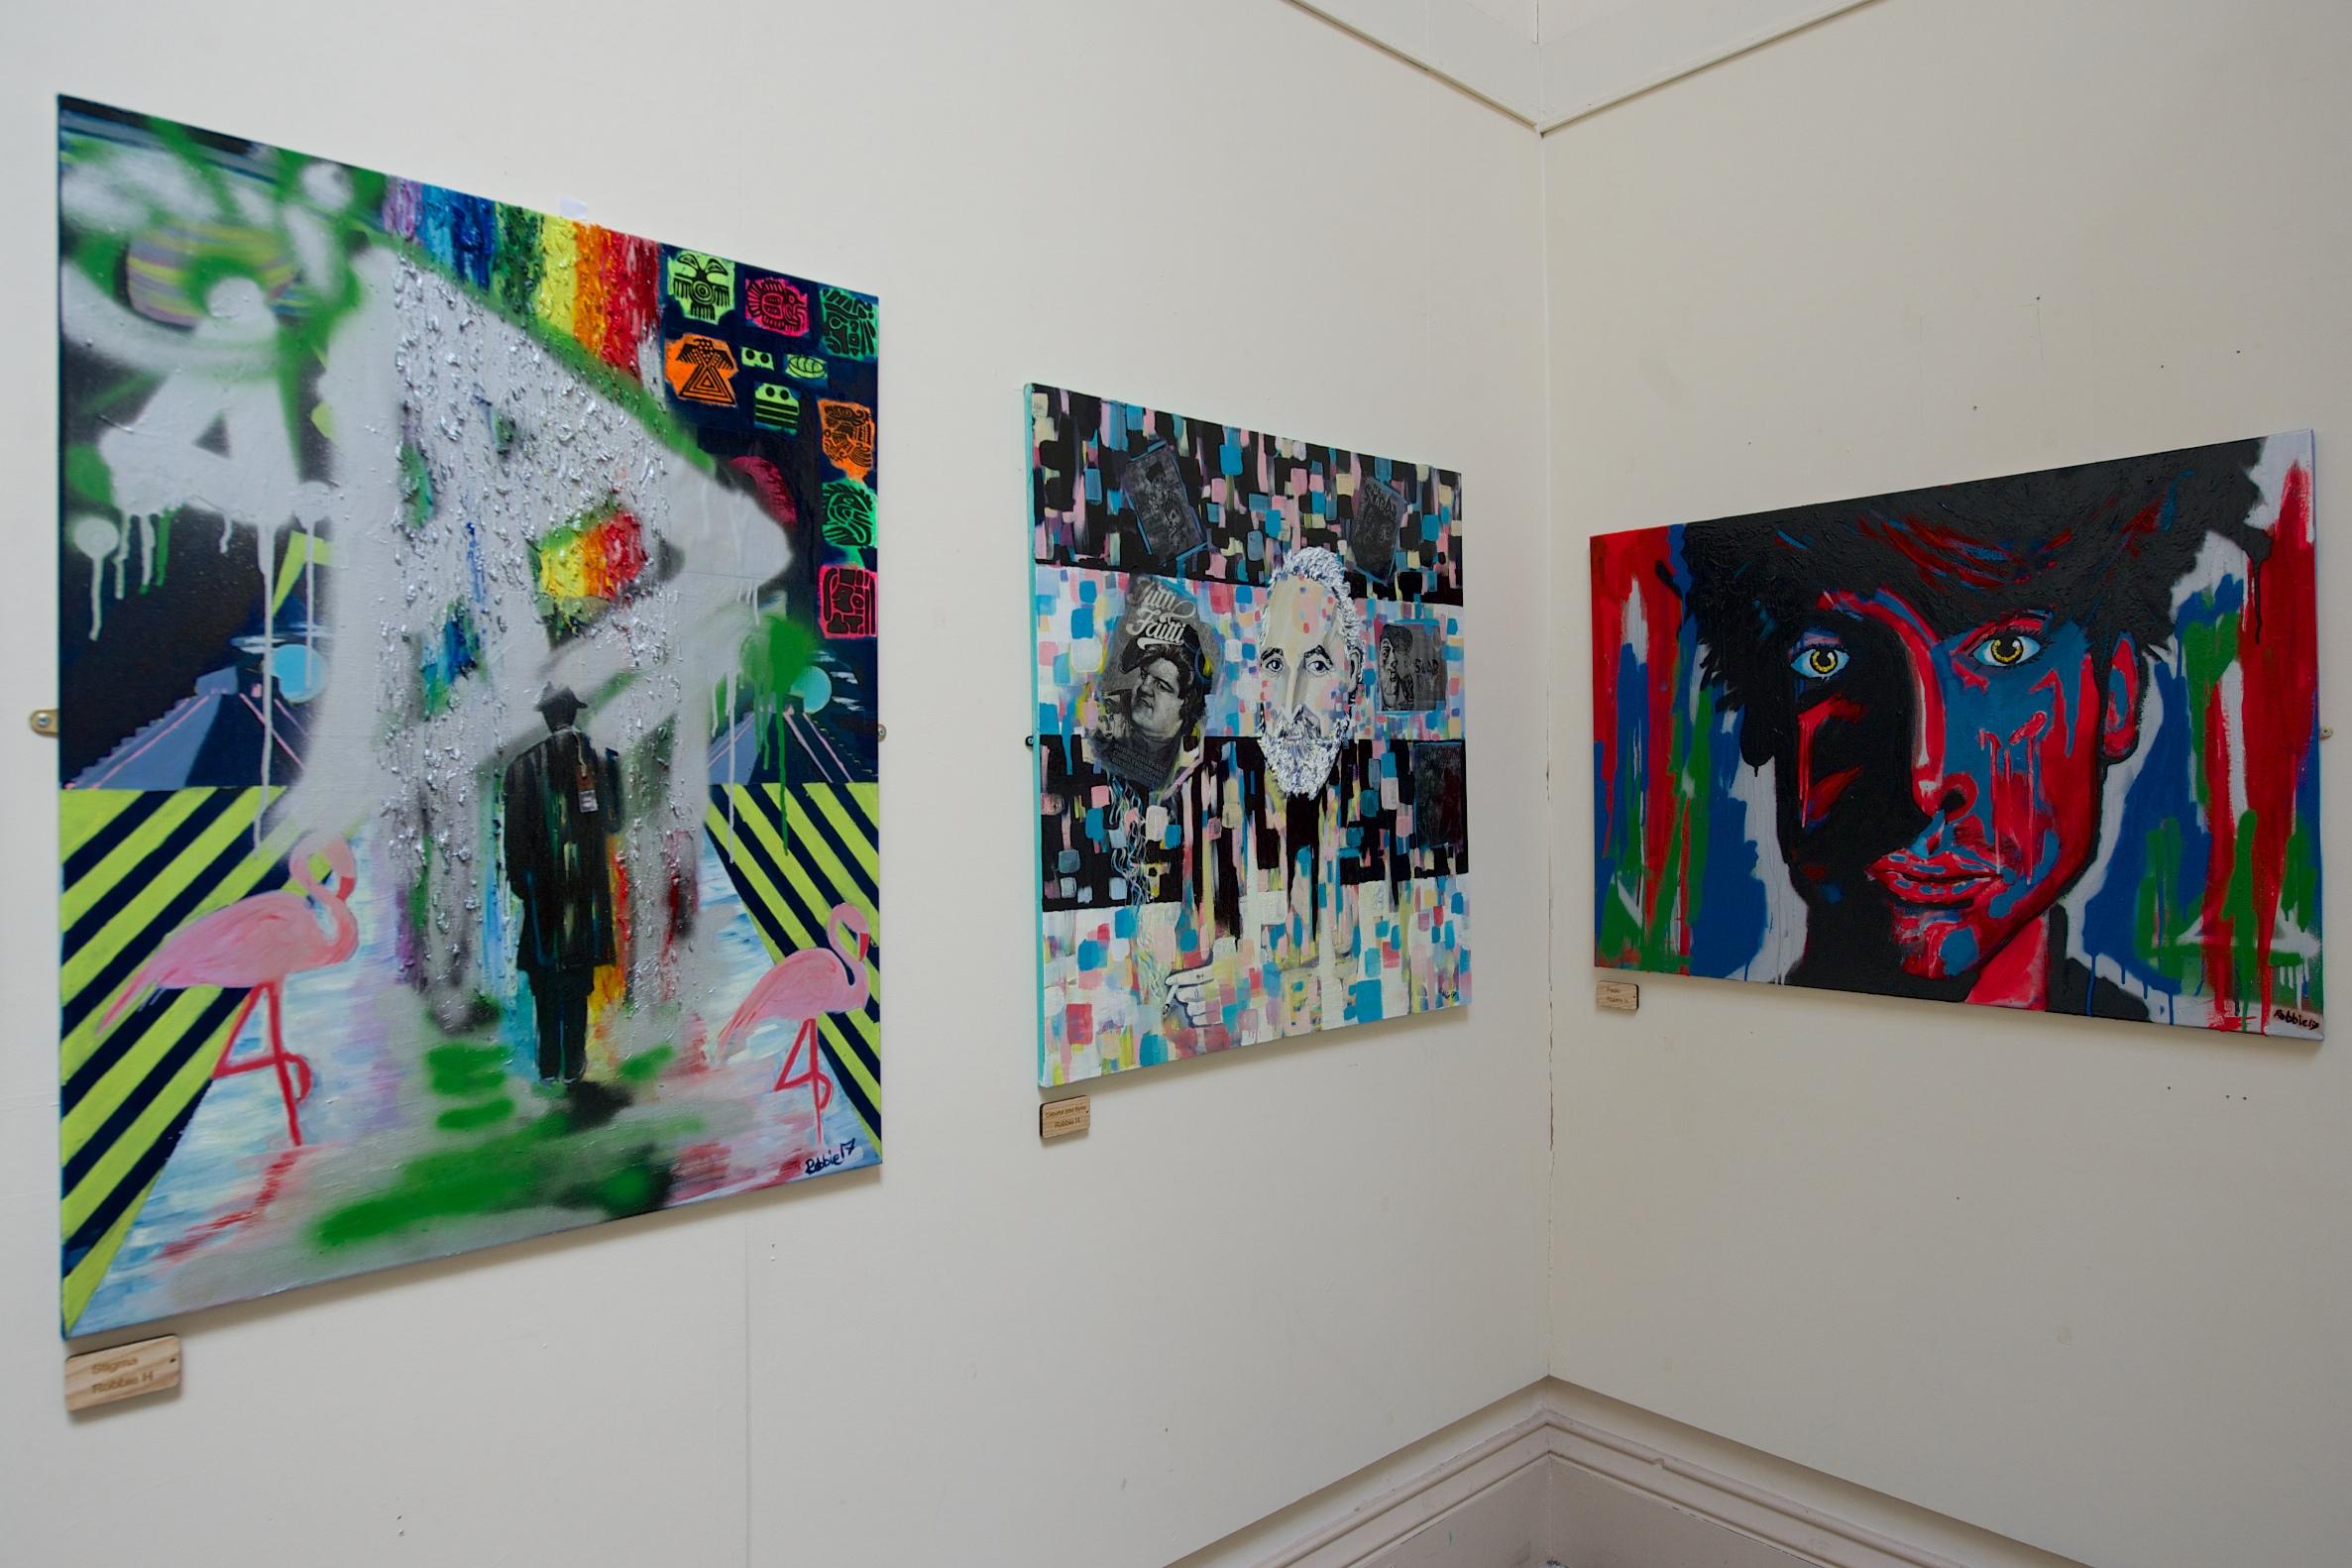 Exhibition of prisoner artwork helps weave new side to Paisley 2021 bid